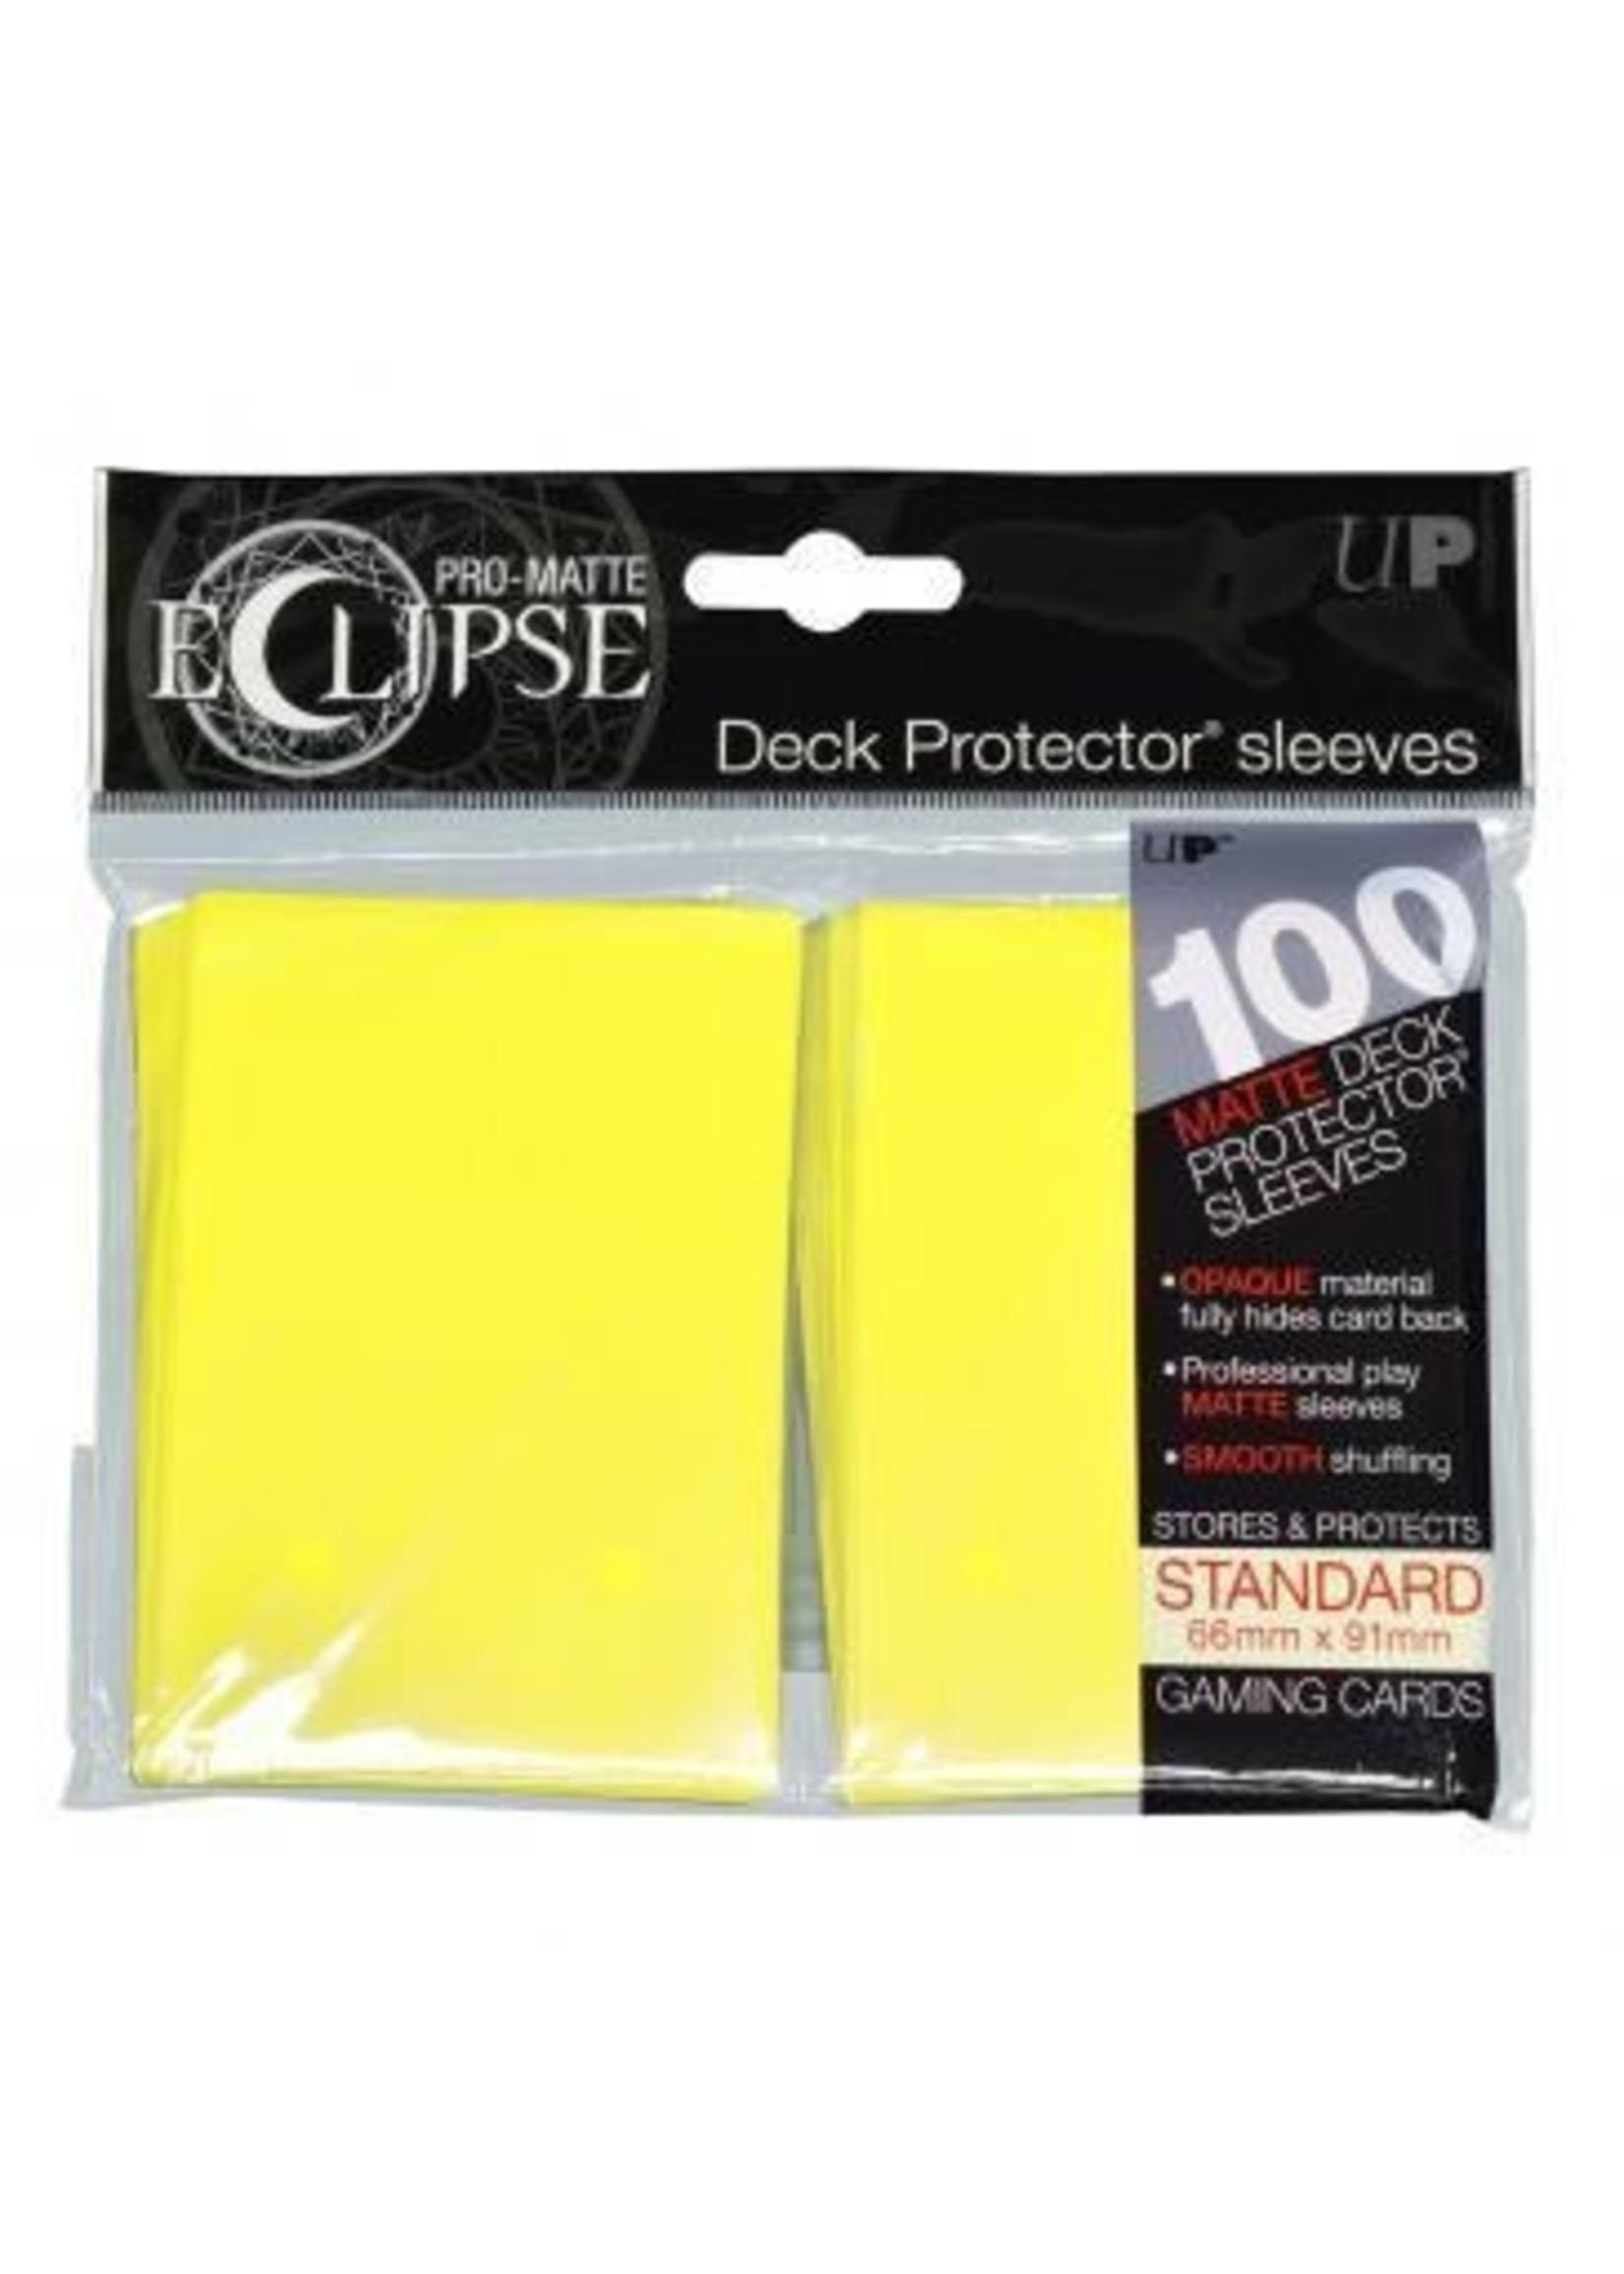 Pro-Matte Eclipse 2.0 Standard Deck Protector Sleeves: Lemon Yellow (100)